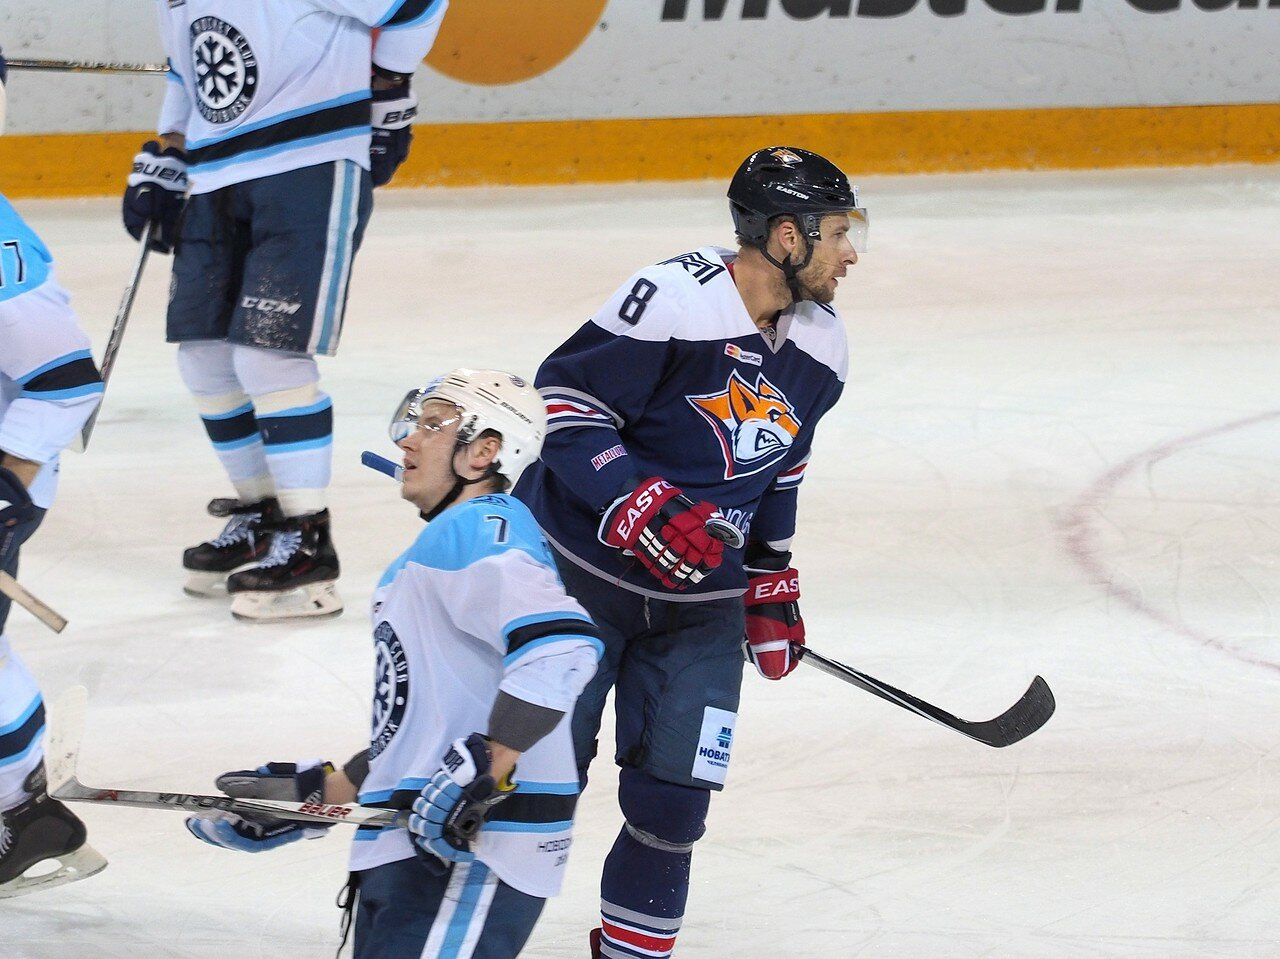 86Плей-офф 2016 Восток 1/2 Металлург - Сибирь 10.03.2016